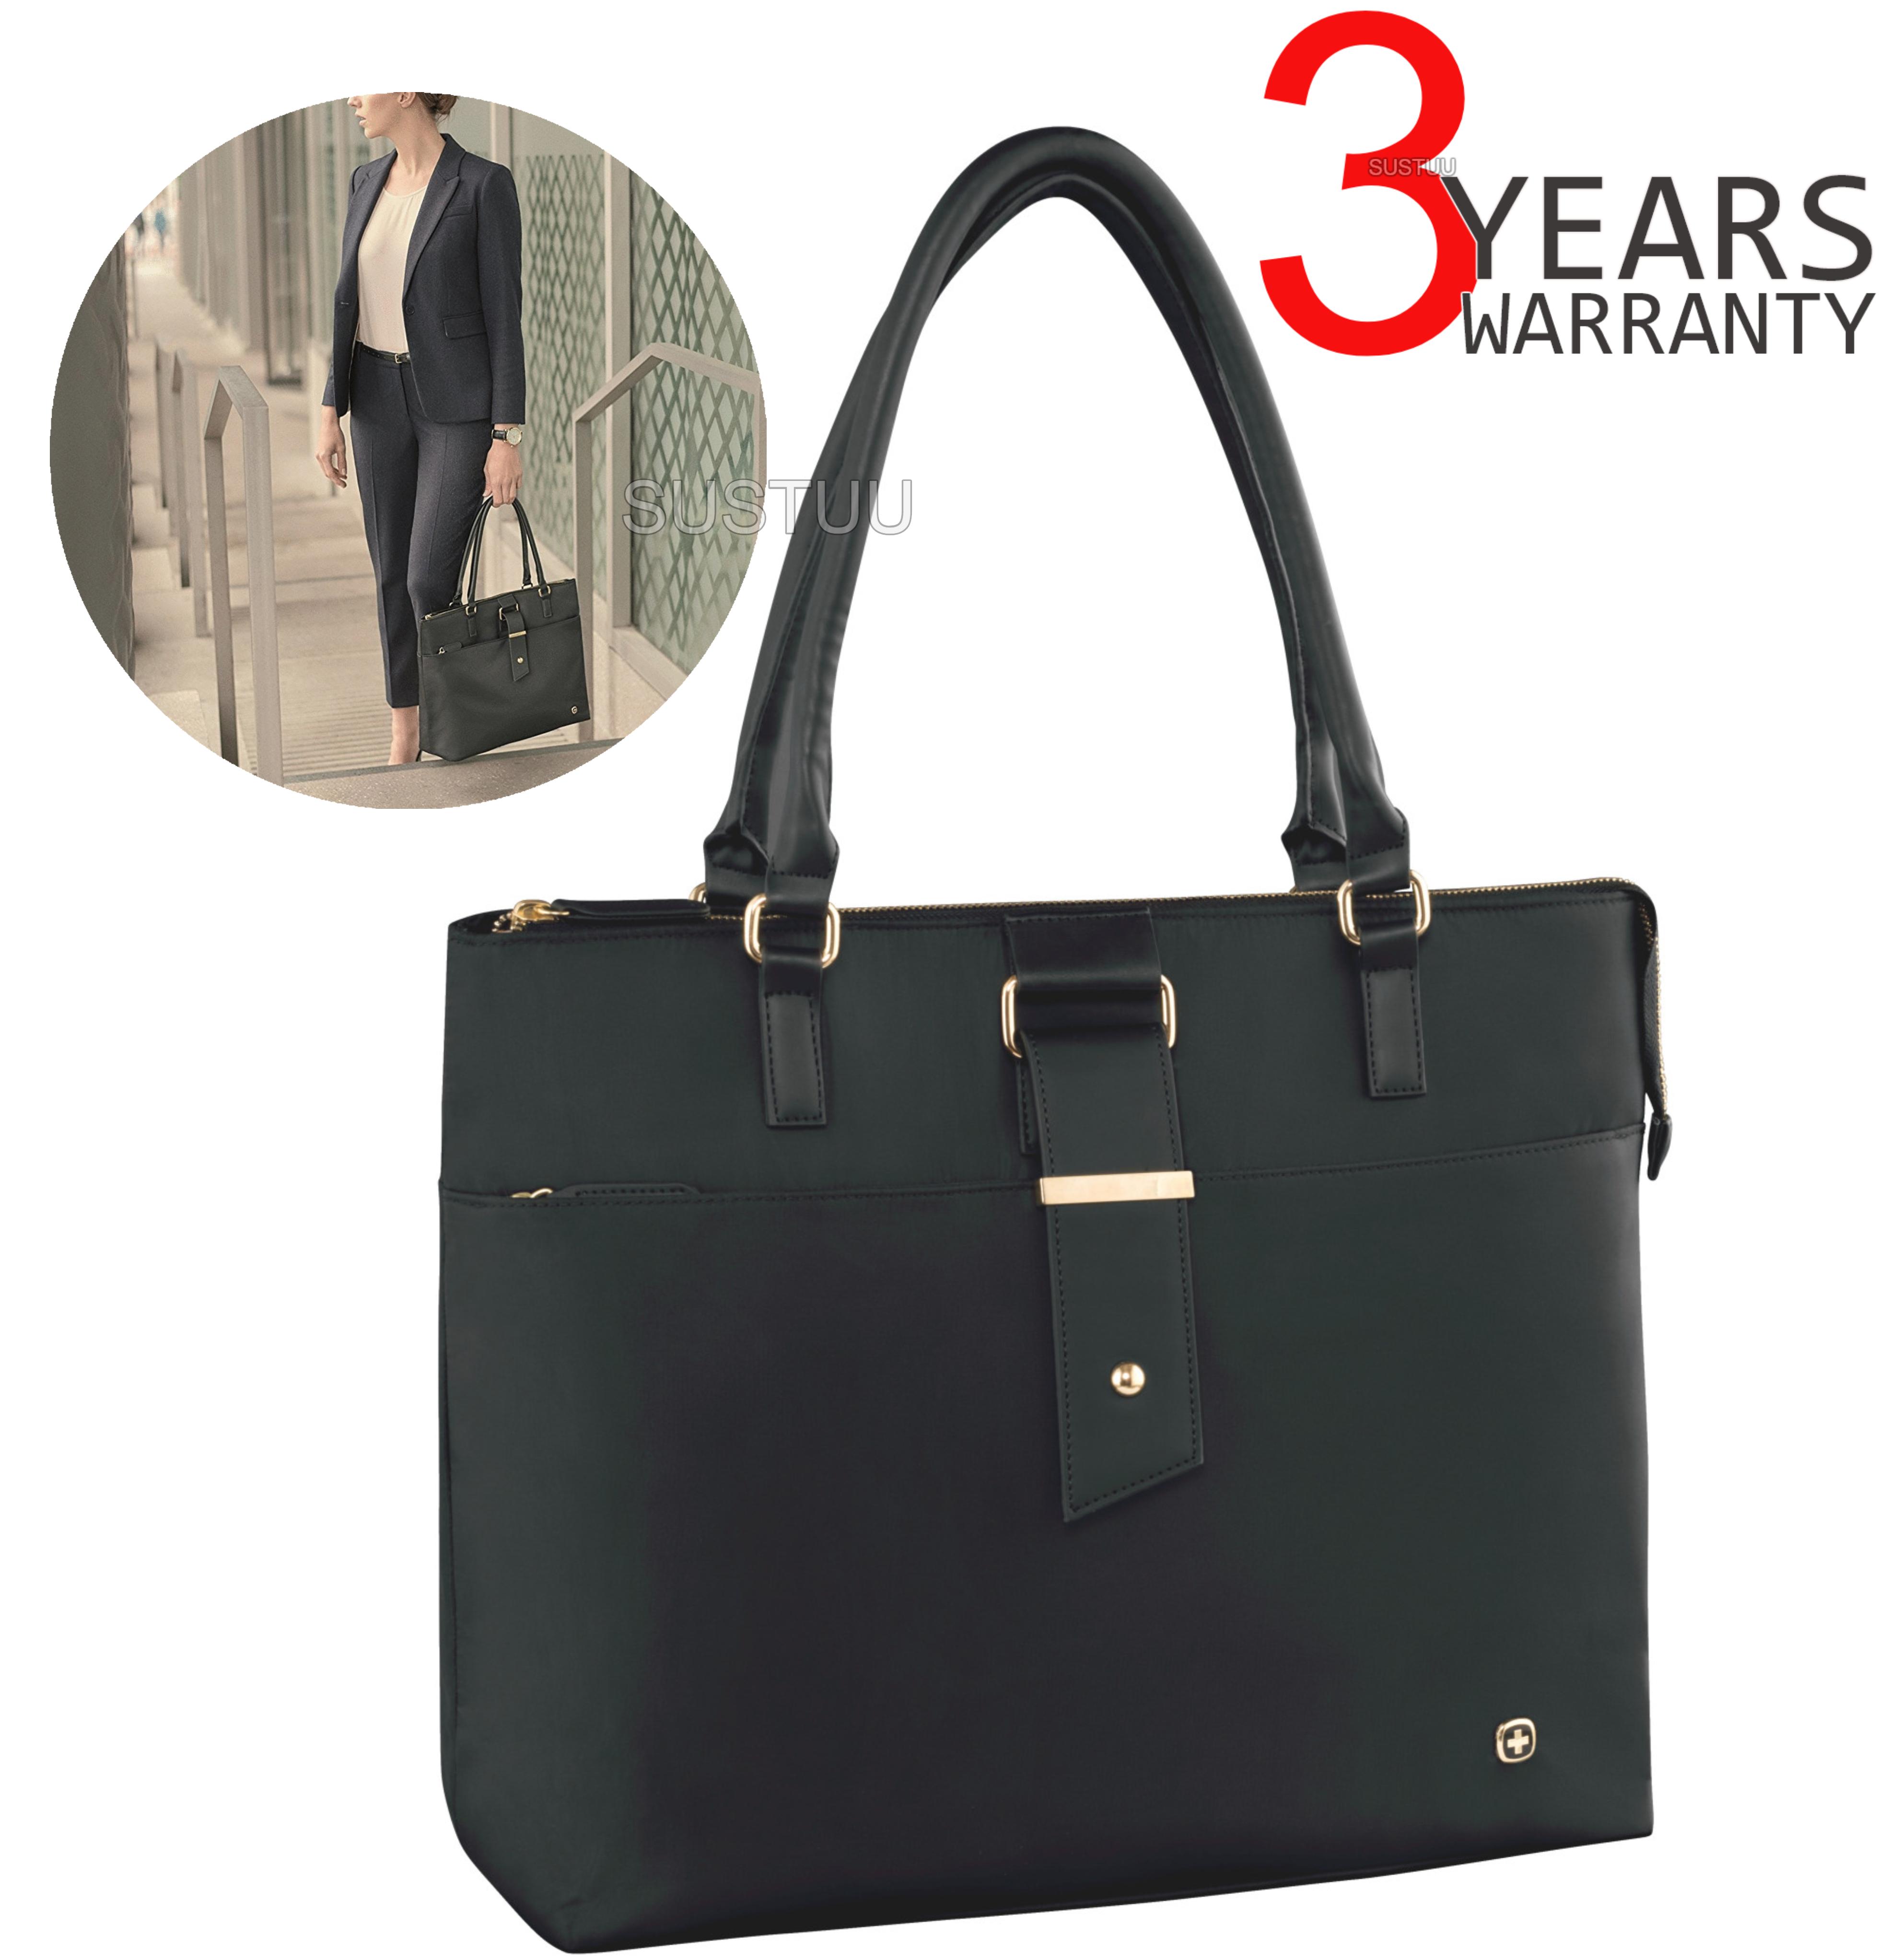 5d5ae2610 Wenger Ana Women's Padded Laptop Tote Bag | Tablet Pocket | Interior  Zippered Pocket | Sustuu